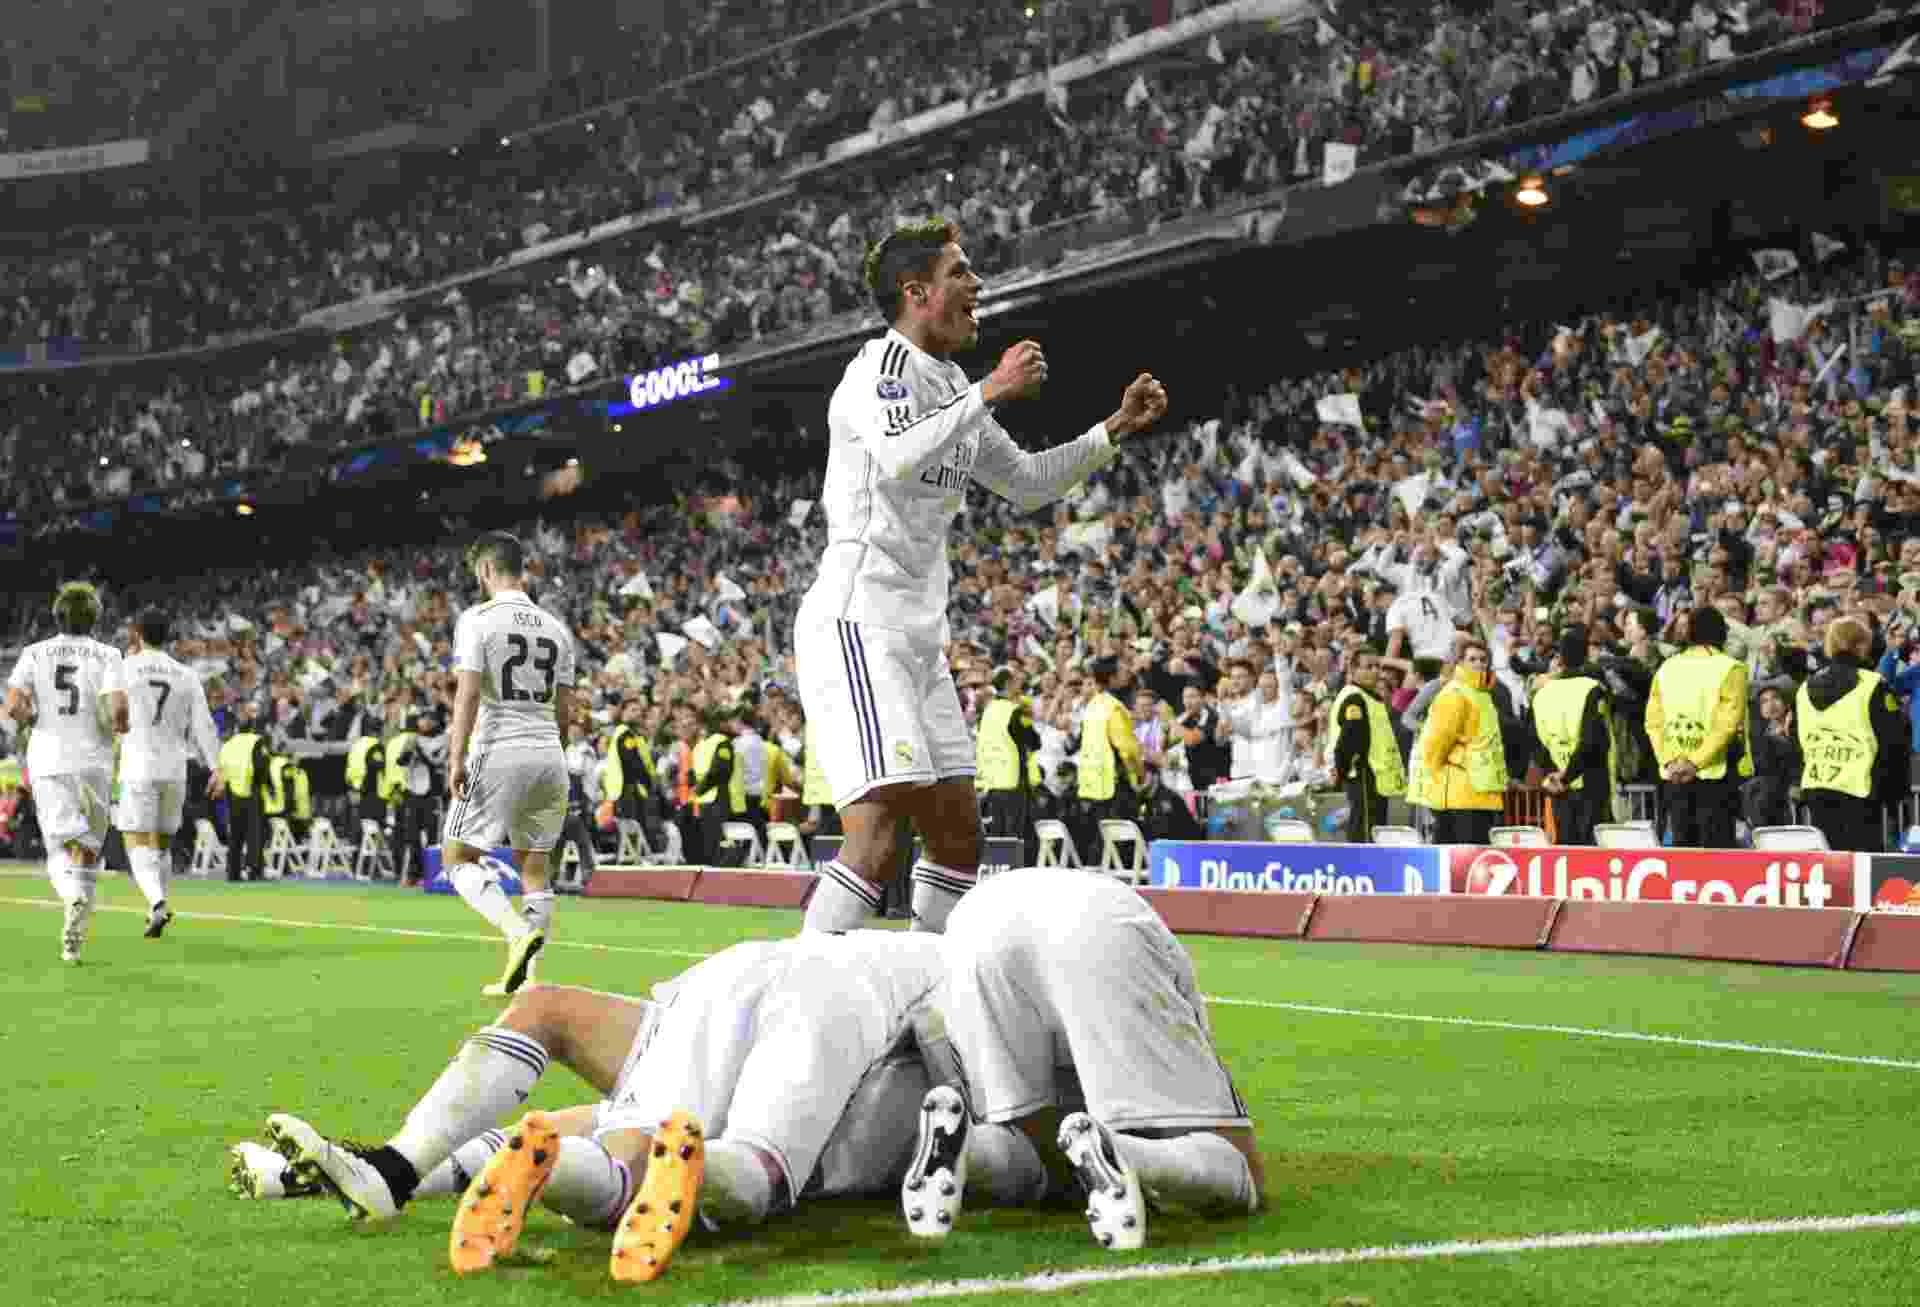 Chicharito Hernández comemora o gol do Real Madrid contra o Atlético rodeado por jogadores - AFP PHOTO / PIERRE-PHILIPPE MARCOU